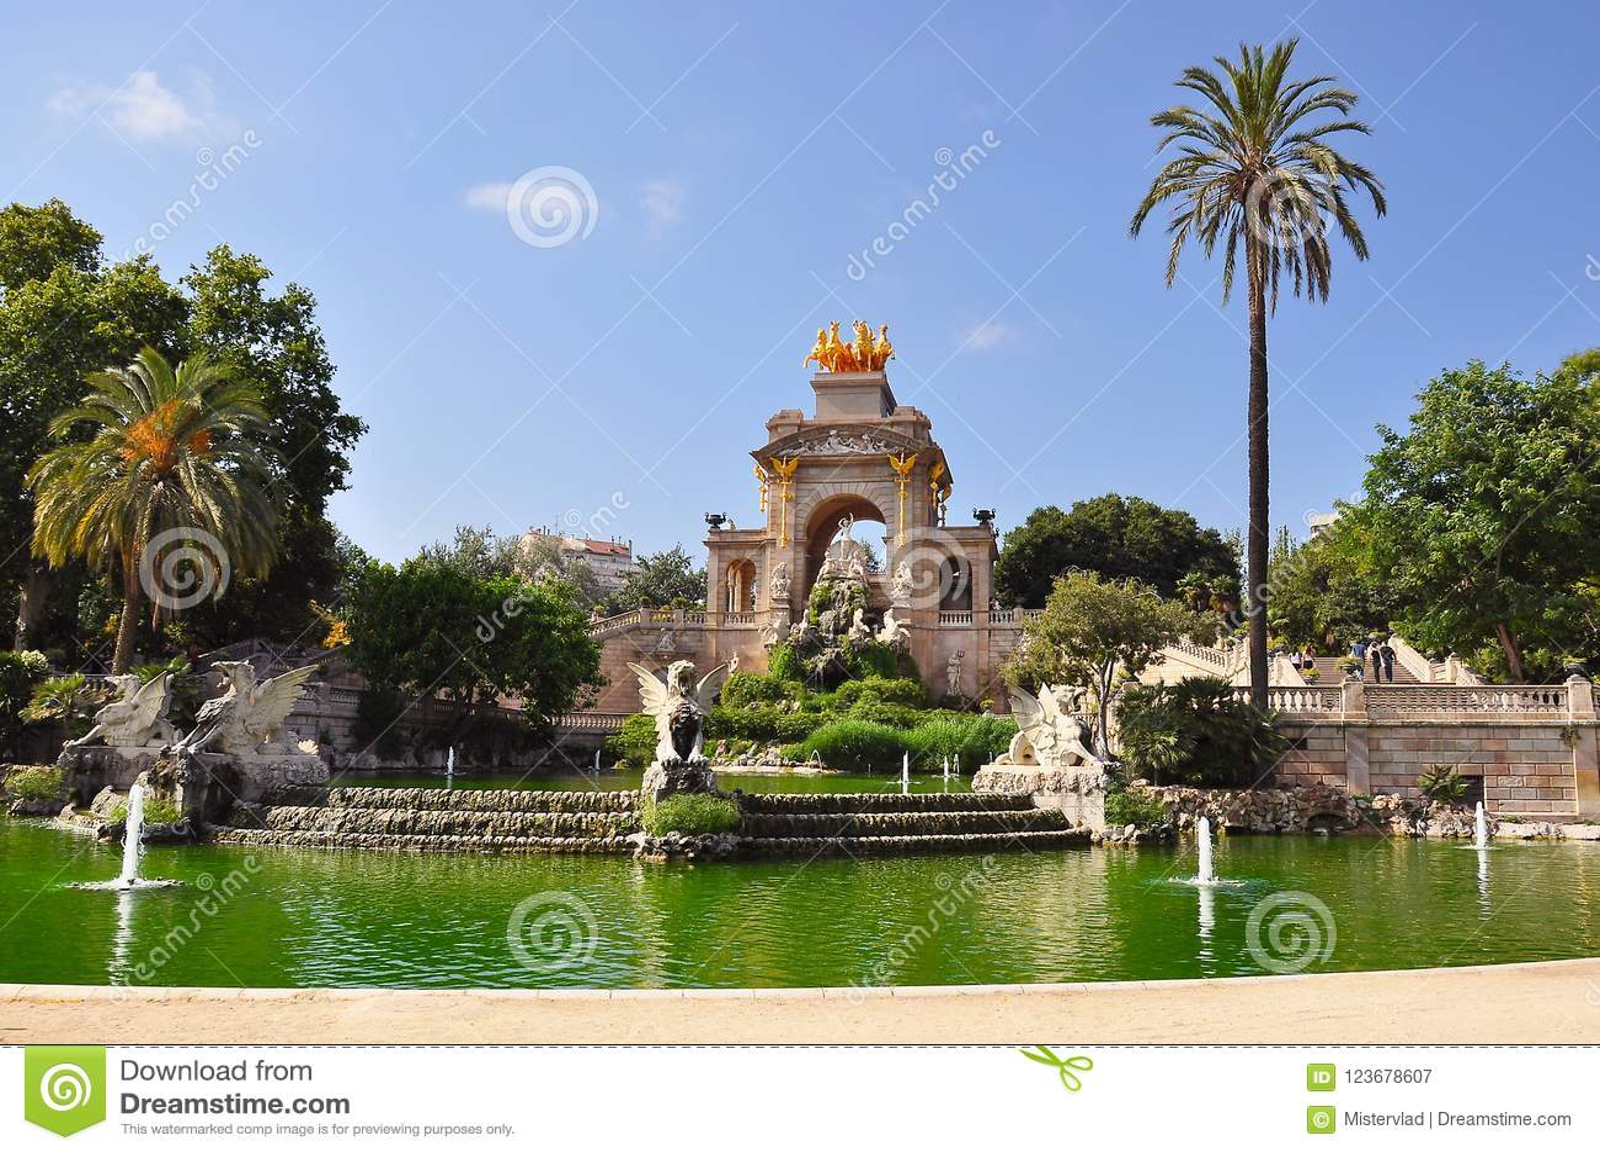 Kaskadowa fontanna w Ciutadella parku, Barcelona, Hiszpania